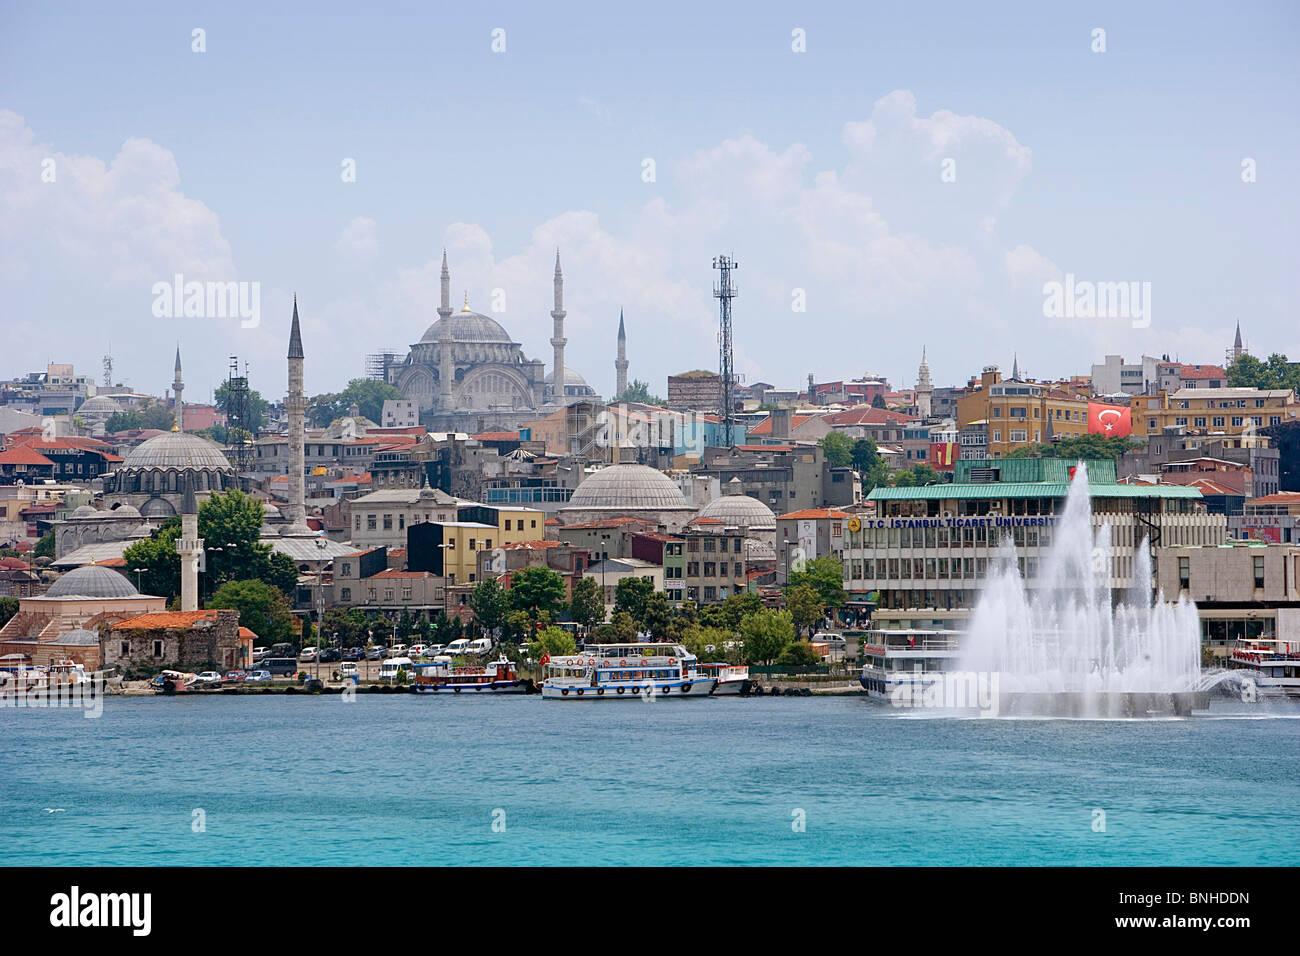 Juni 2008 Türkei Istanbul Stadt Schiffe Boote Brunnen Meer Stockbild